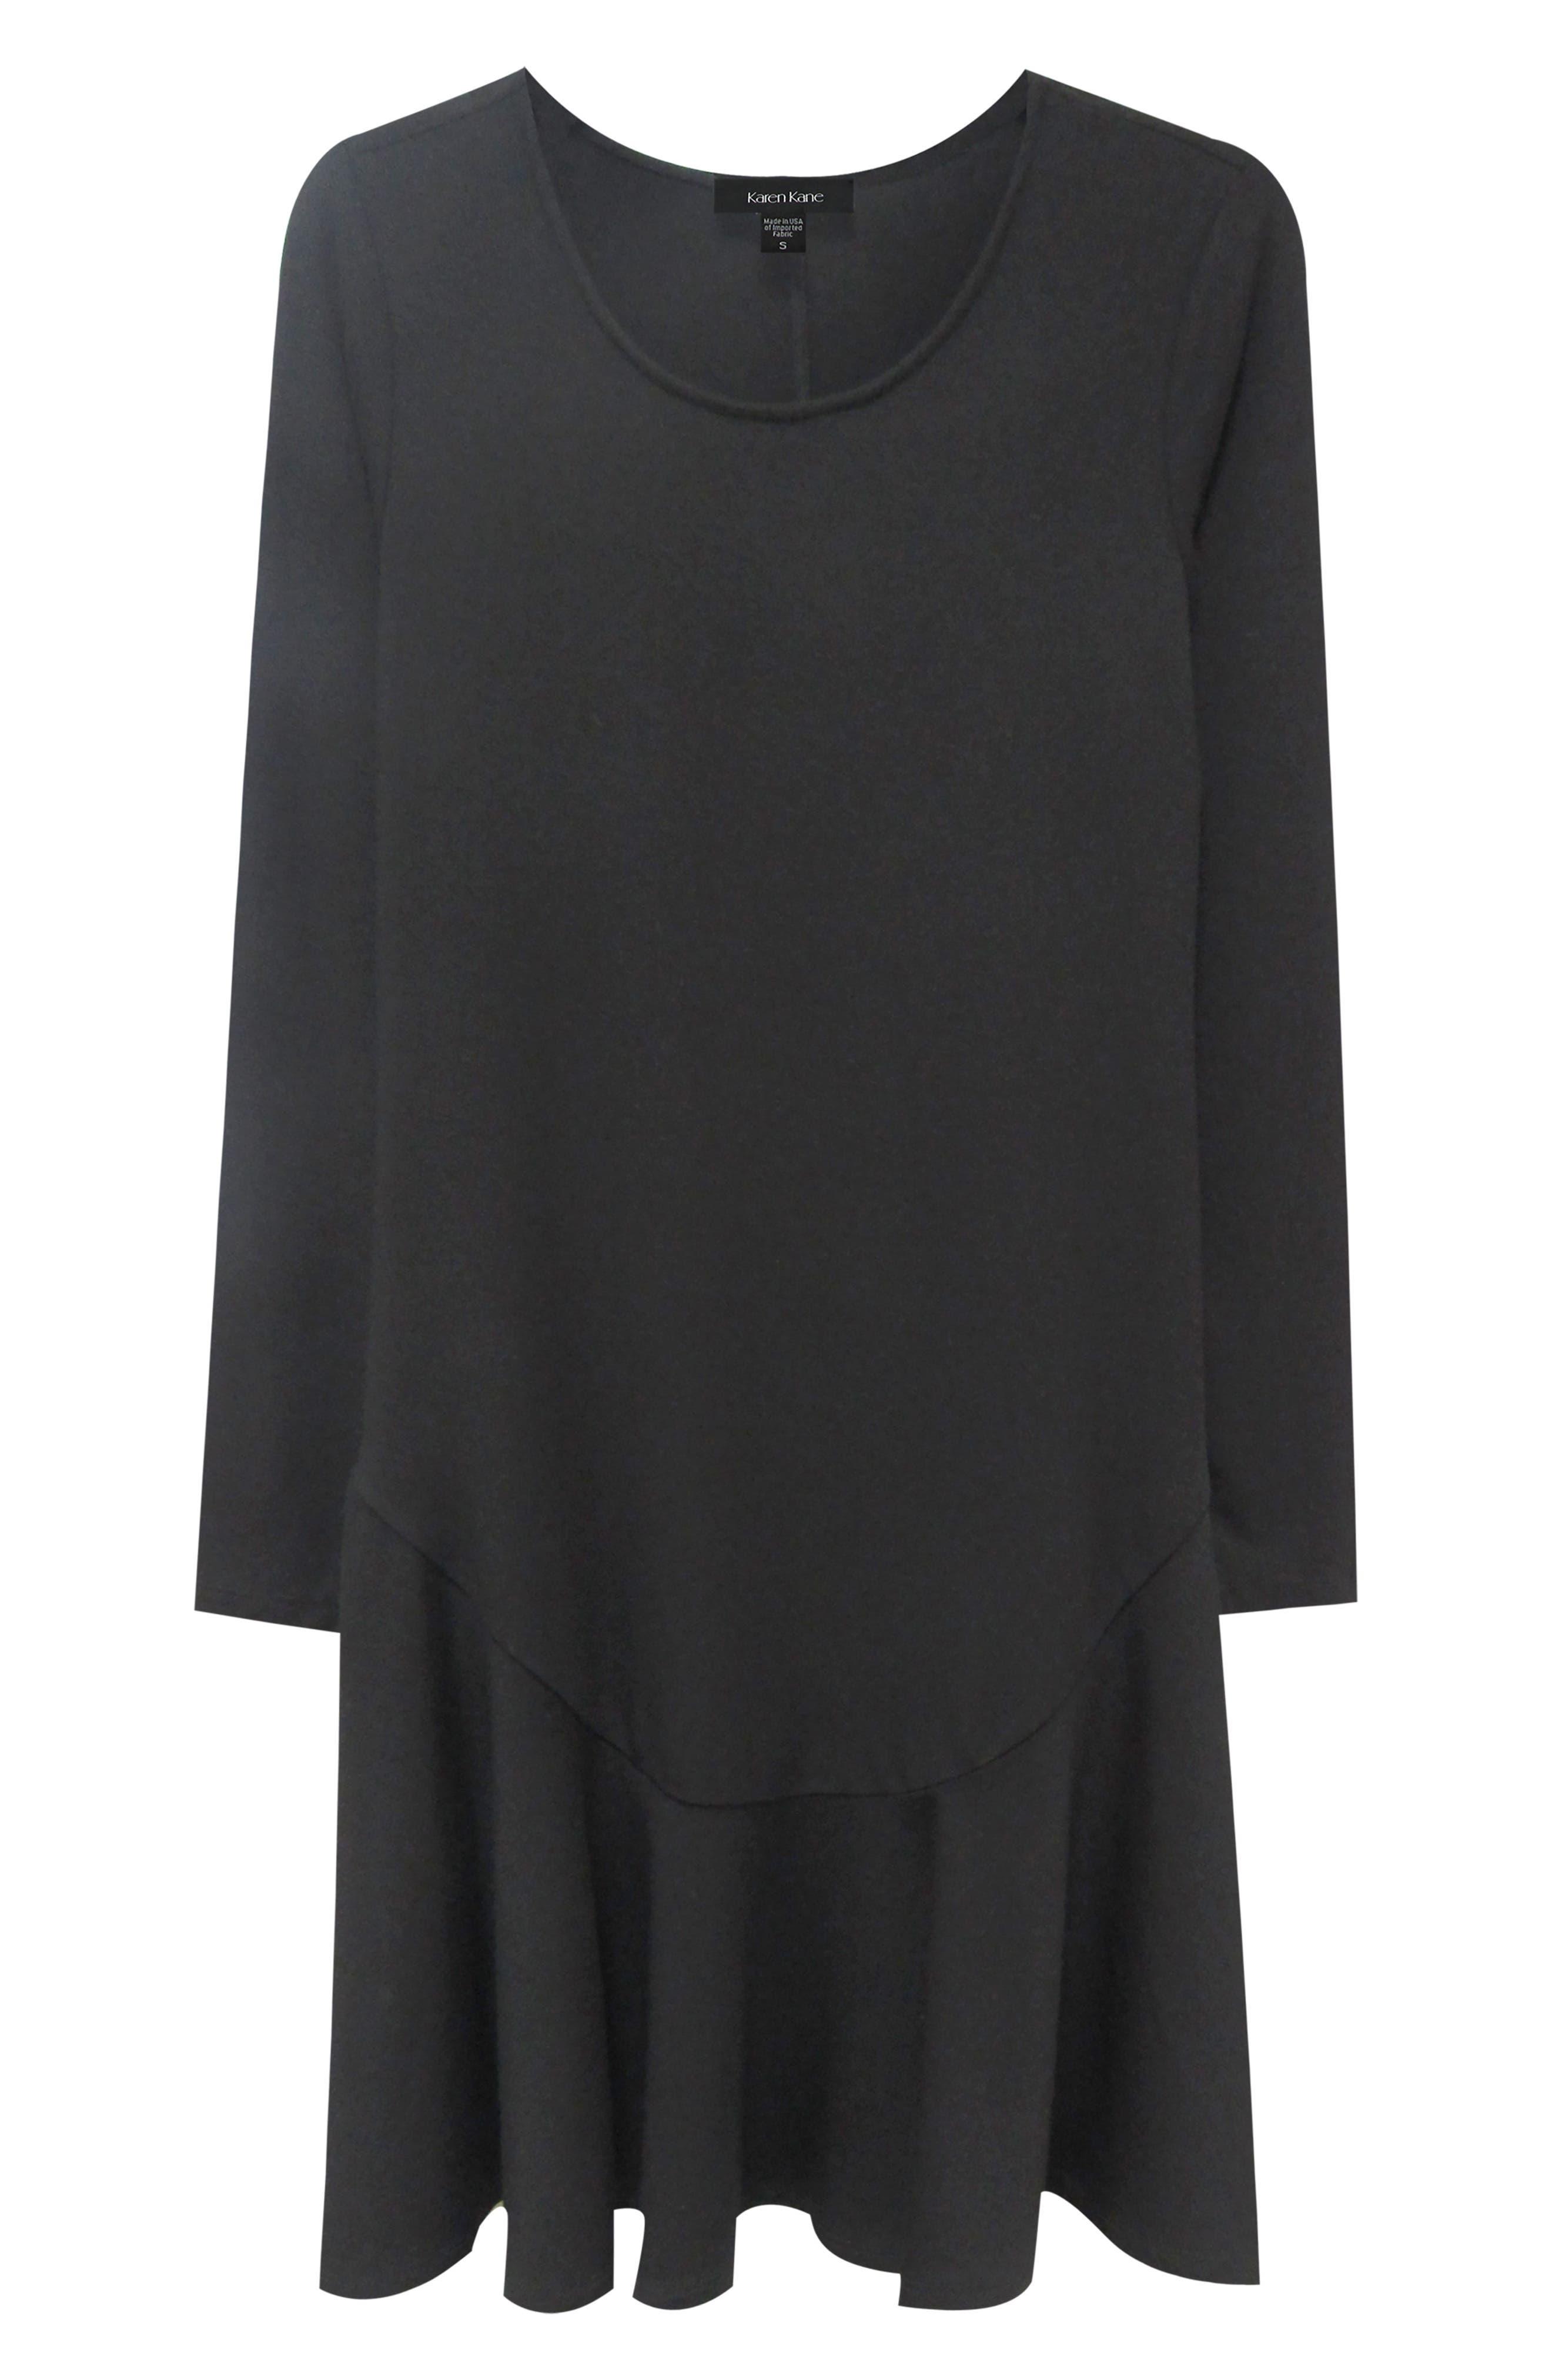 KAREN KANE, Dakota Ruffle Hem A-Line Dress, Alternate thumbnail 3, color, BLACK